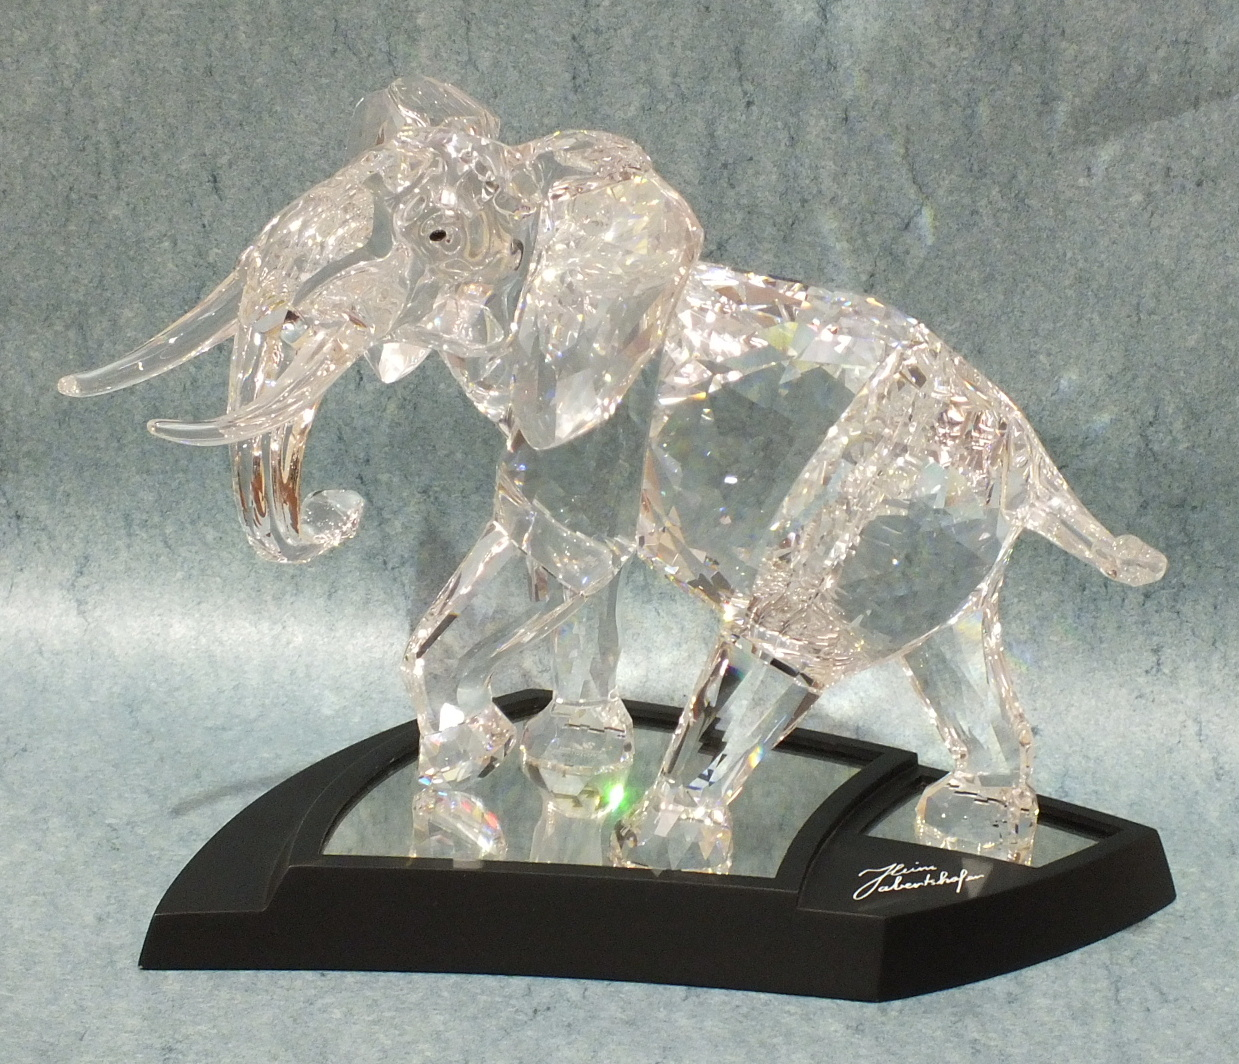 Lot 179 - A Swarovski Limited Edition crystal figure 'Elephant', date 2006, designed by Heinz Tabertshofer,